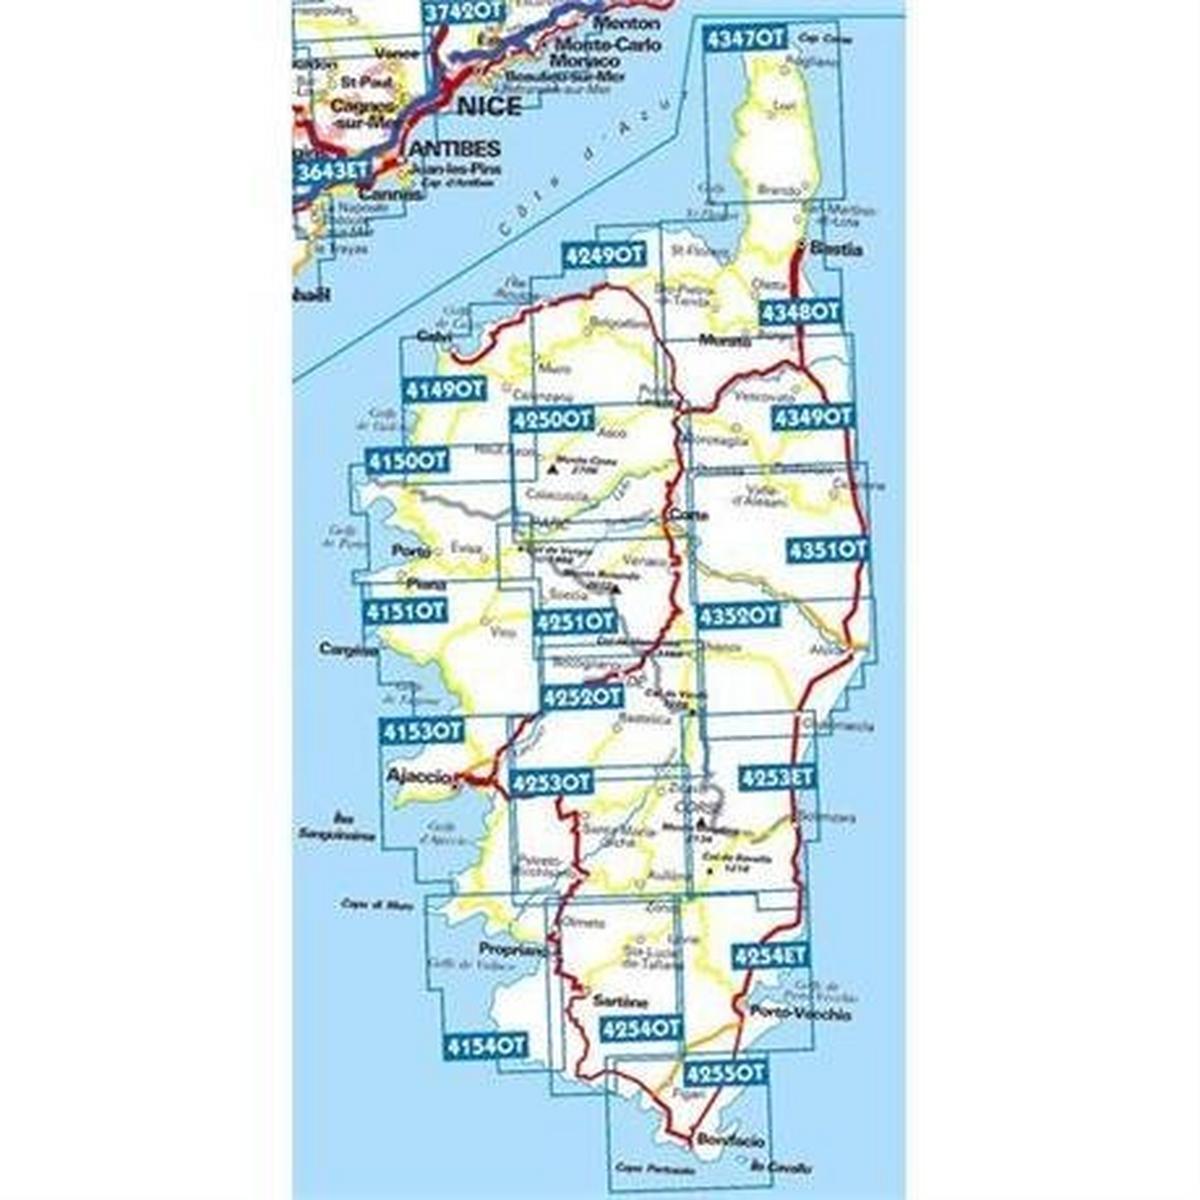 Ign Maps France Map 4253 OT Corsica: Petreto Bicchisano 1:25,000